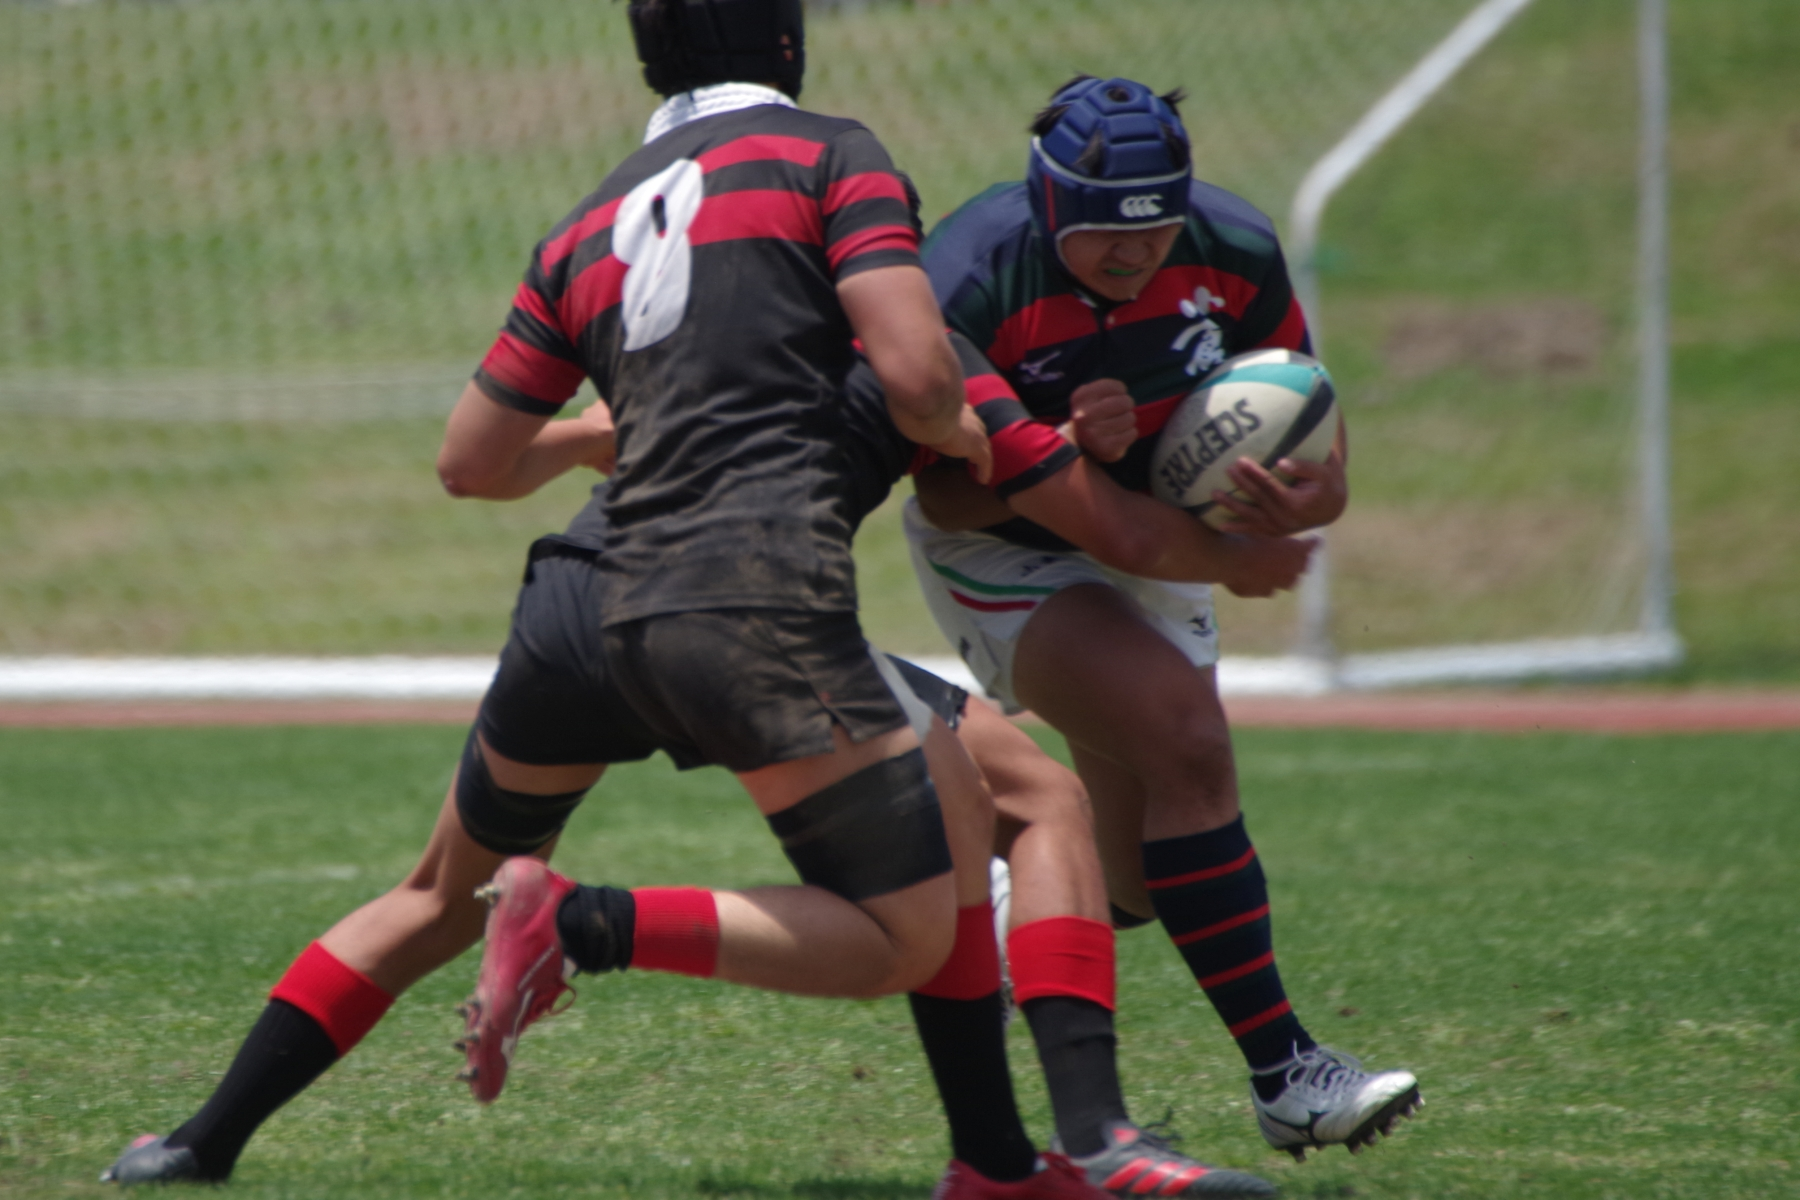 http://kokura-rugby.sakura.ne.jp/180520_123048_0207.jpg